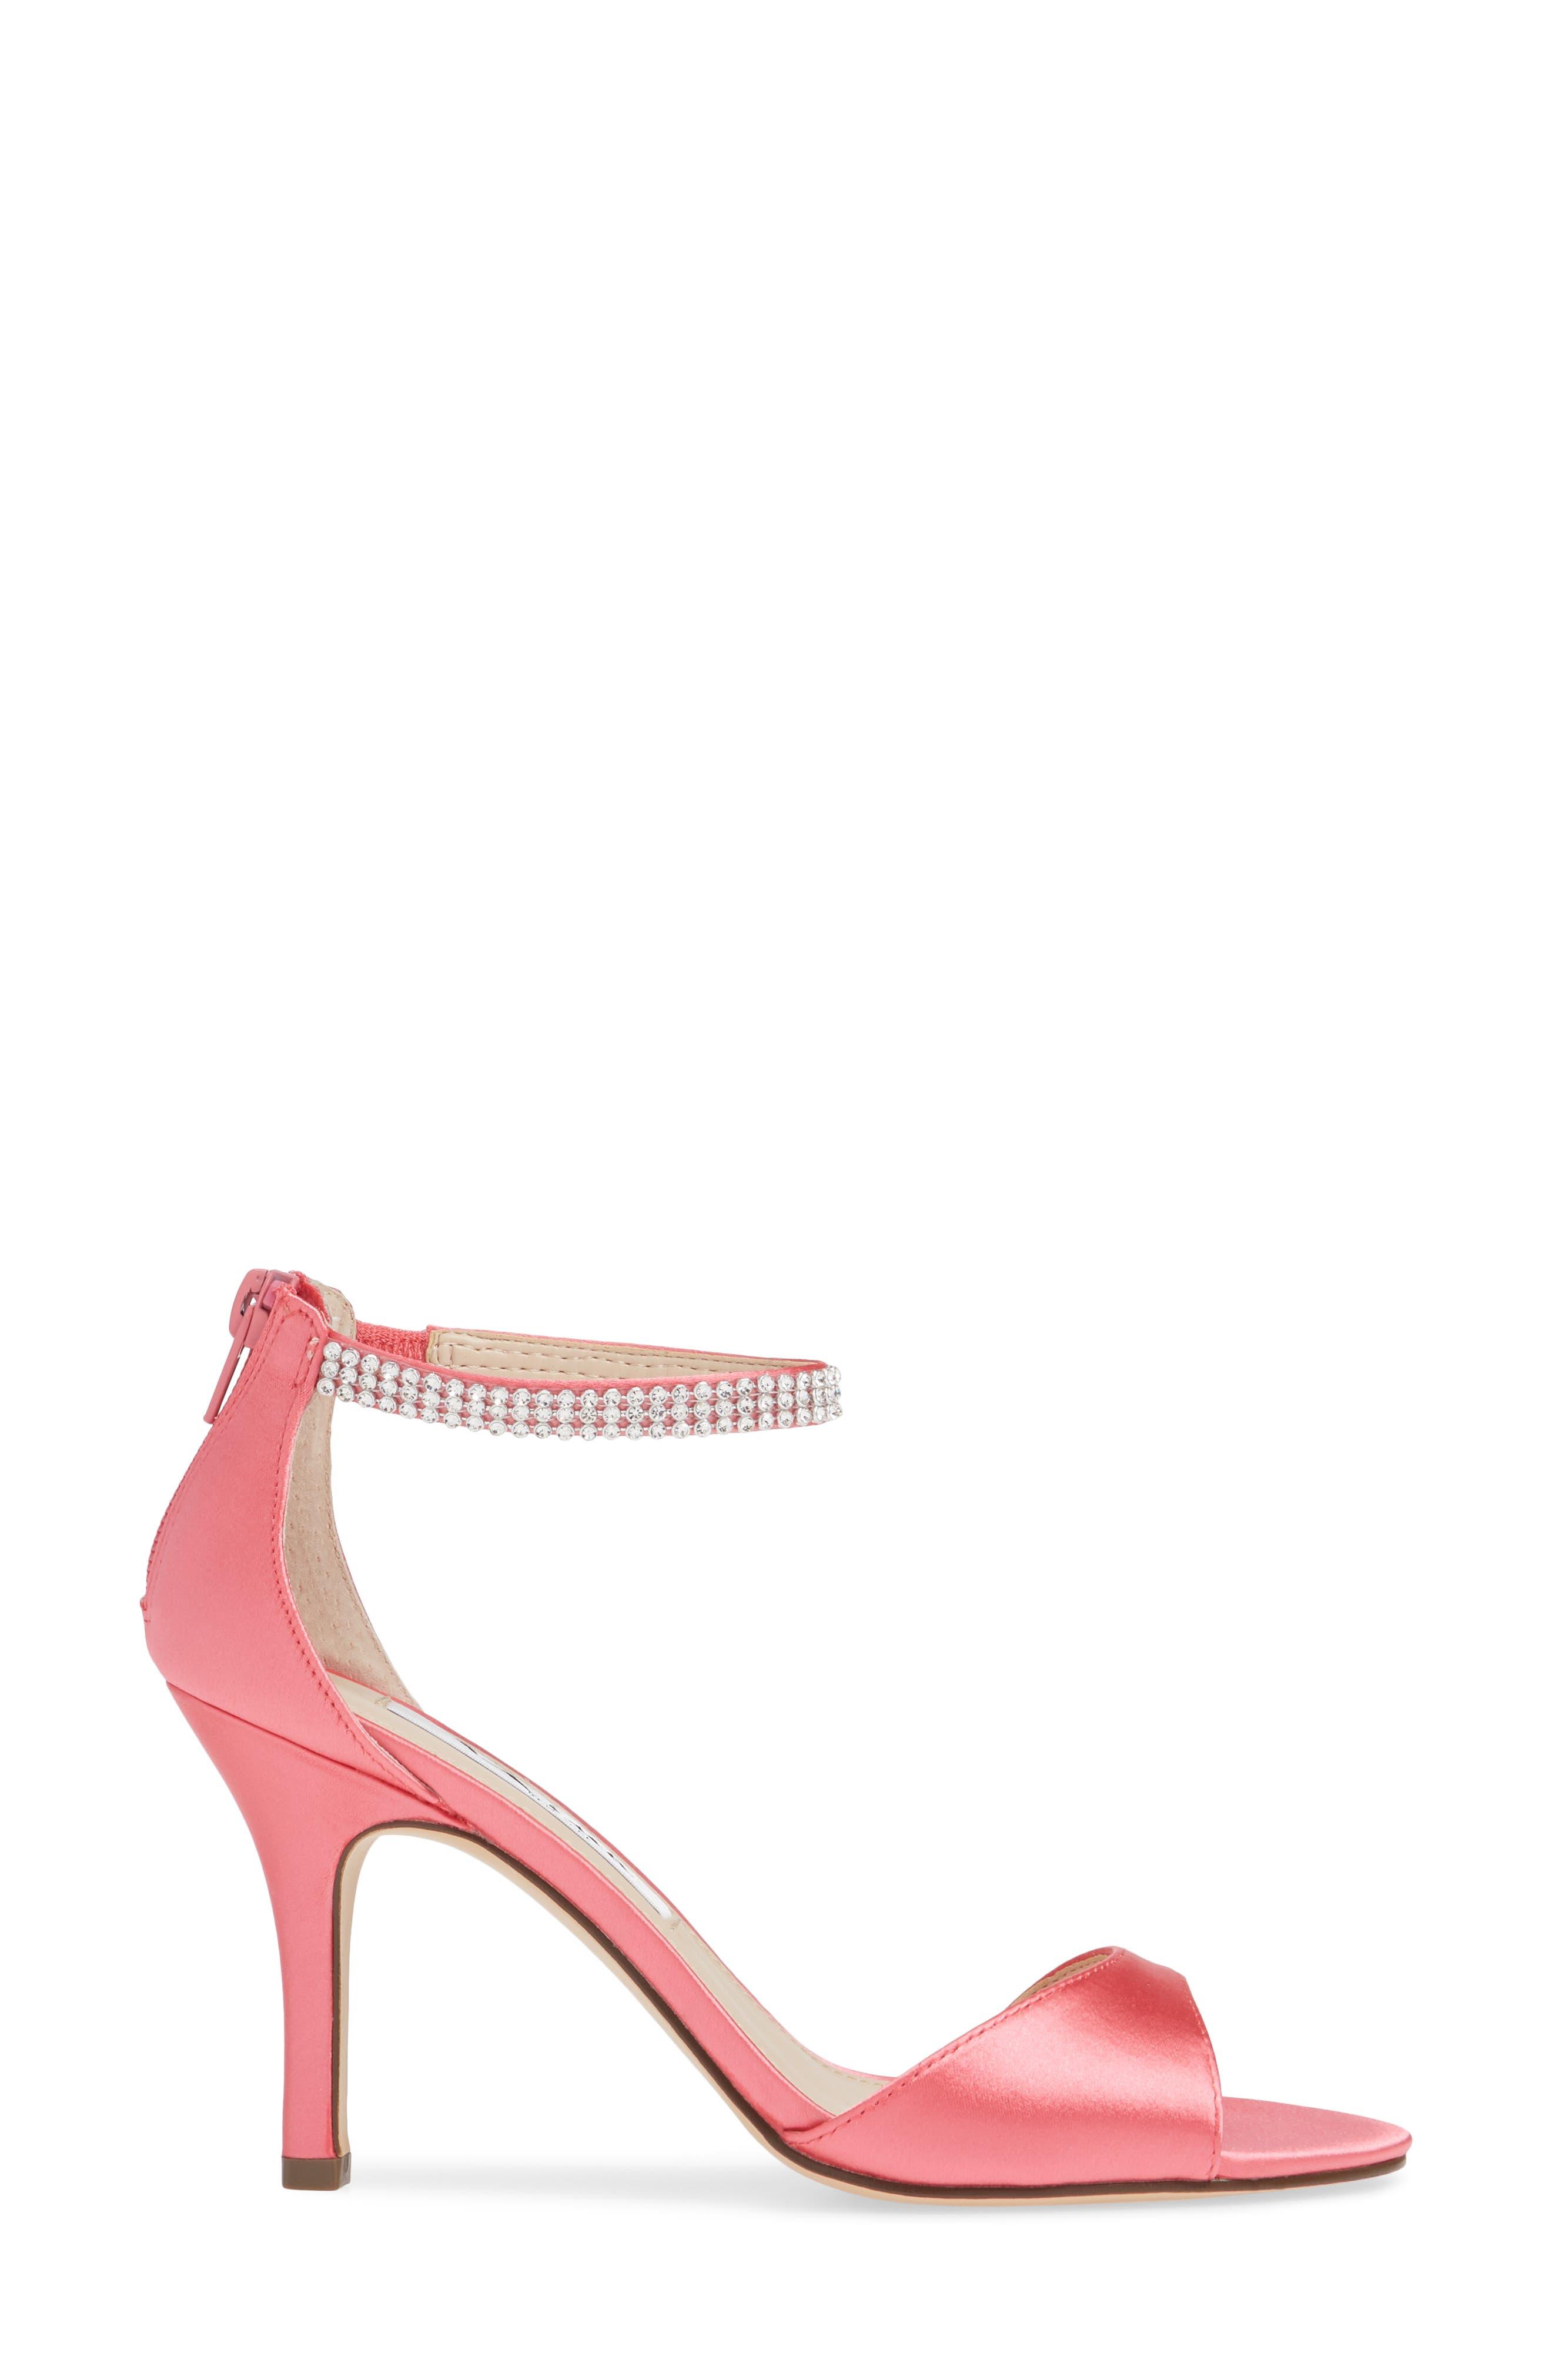 NINA, Volanda Ankle Strap Sandal, Alternate thumbnail 3, color, STRAWBERRY PUNCH SATIN